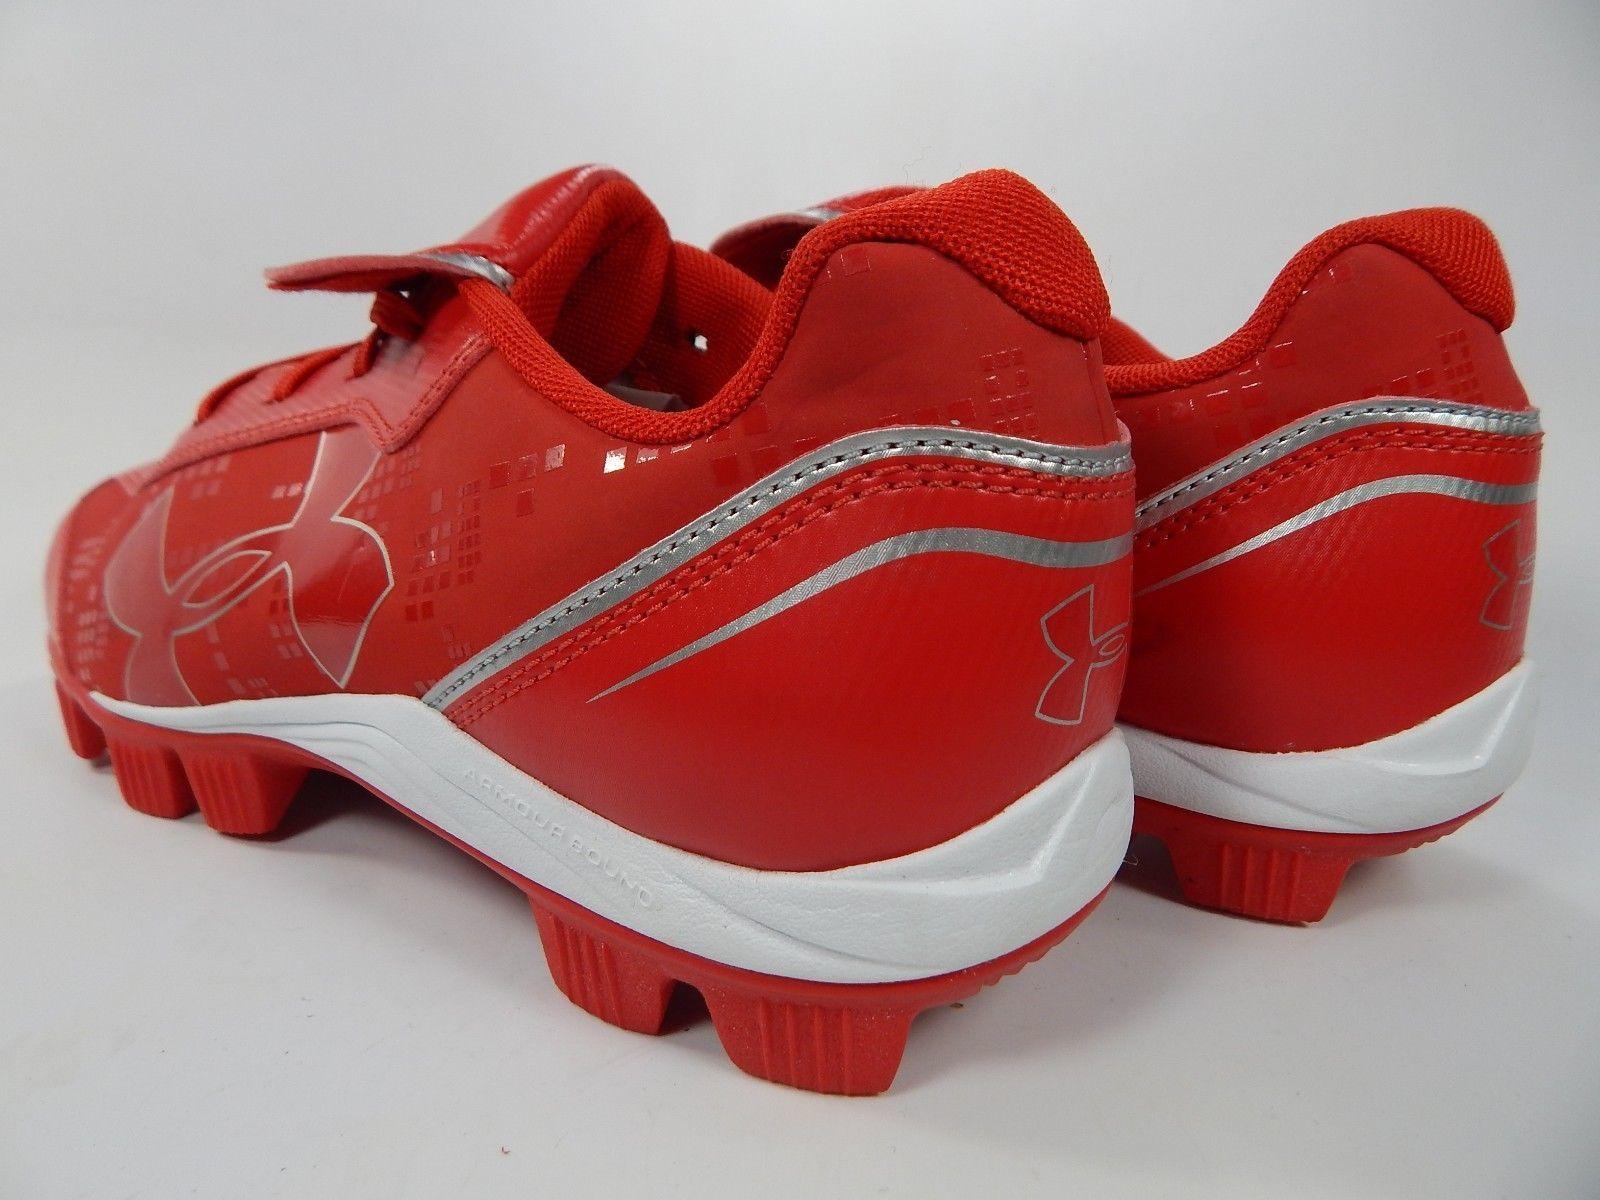 Under Armour Glyde RM CC Size US 9 M EU 40.5 Women's Softball Cleats 1233552-611